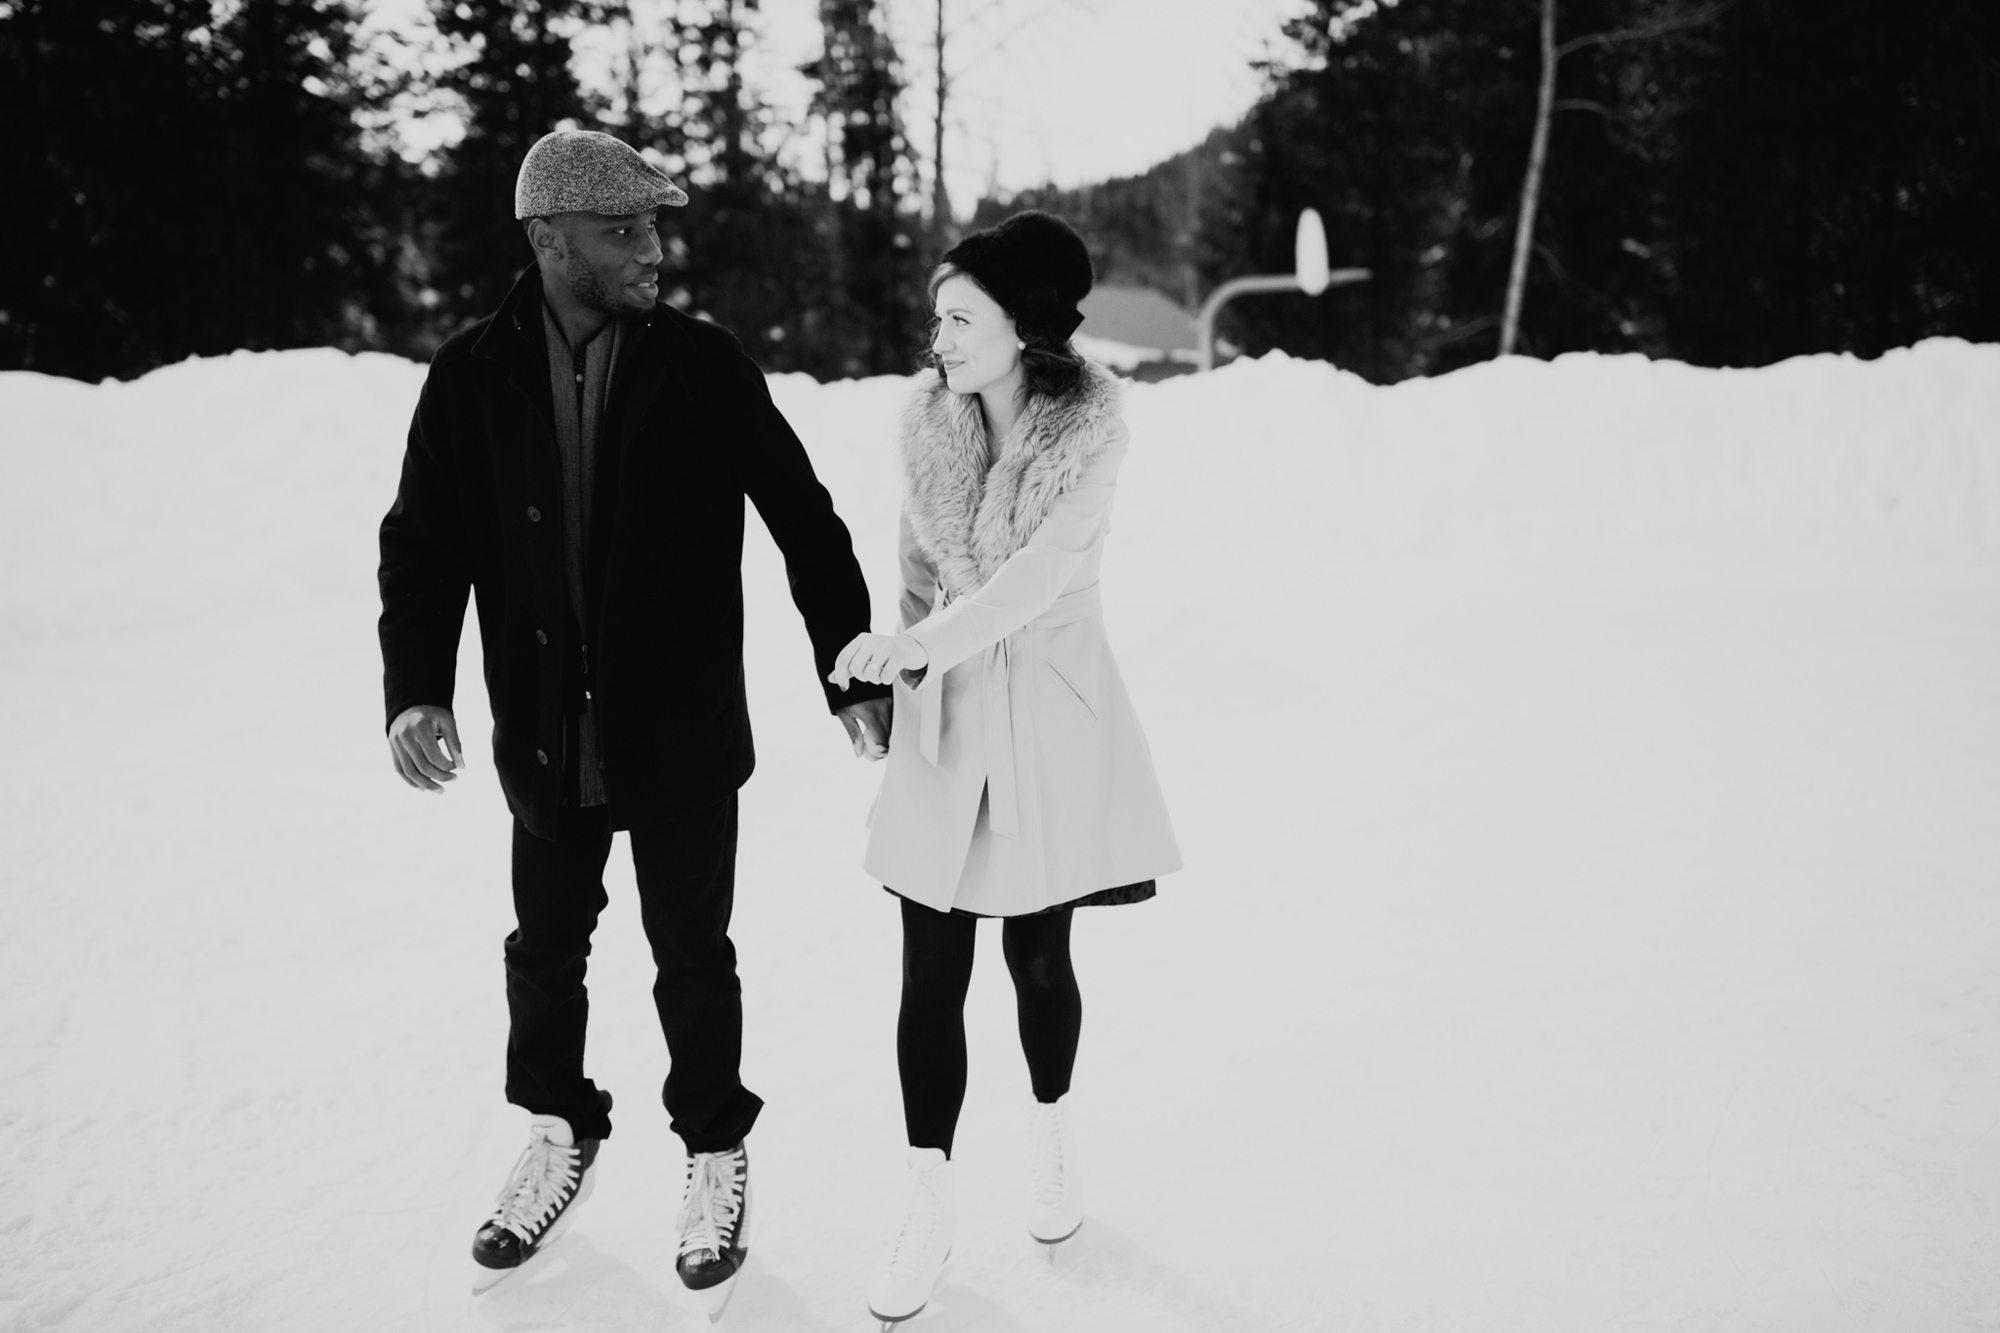 064-adventure-engagement-photographer